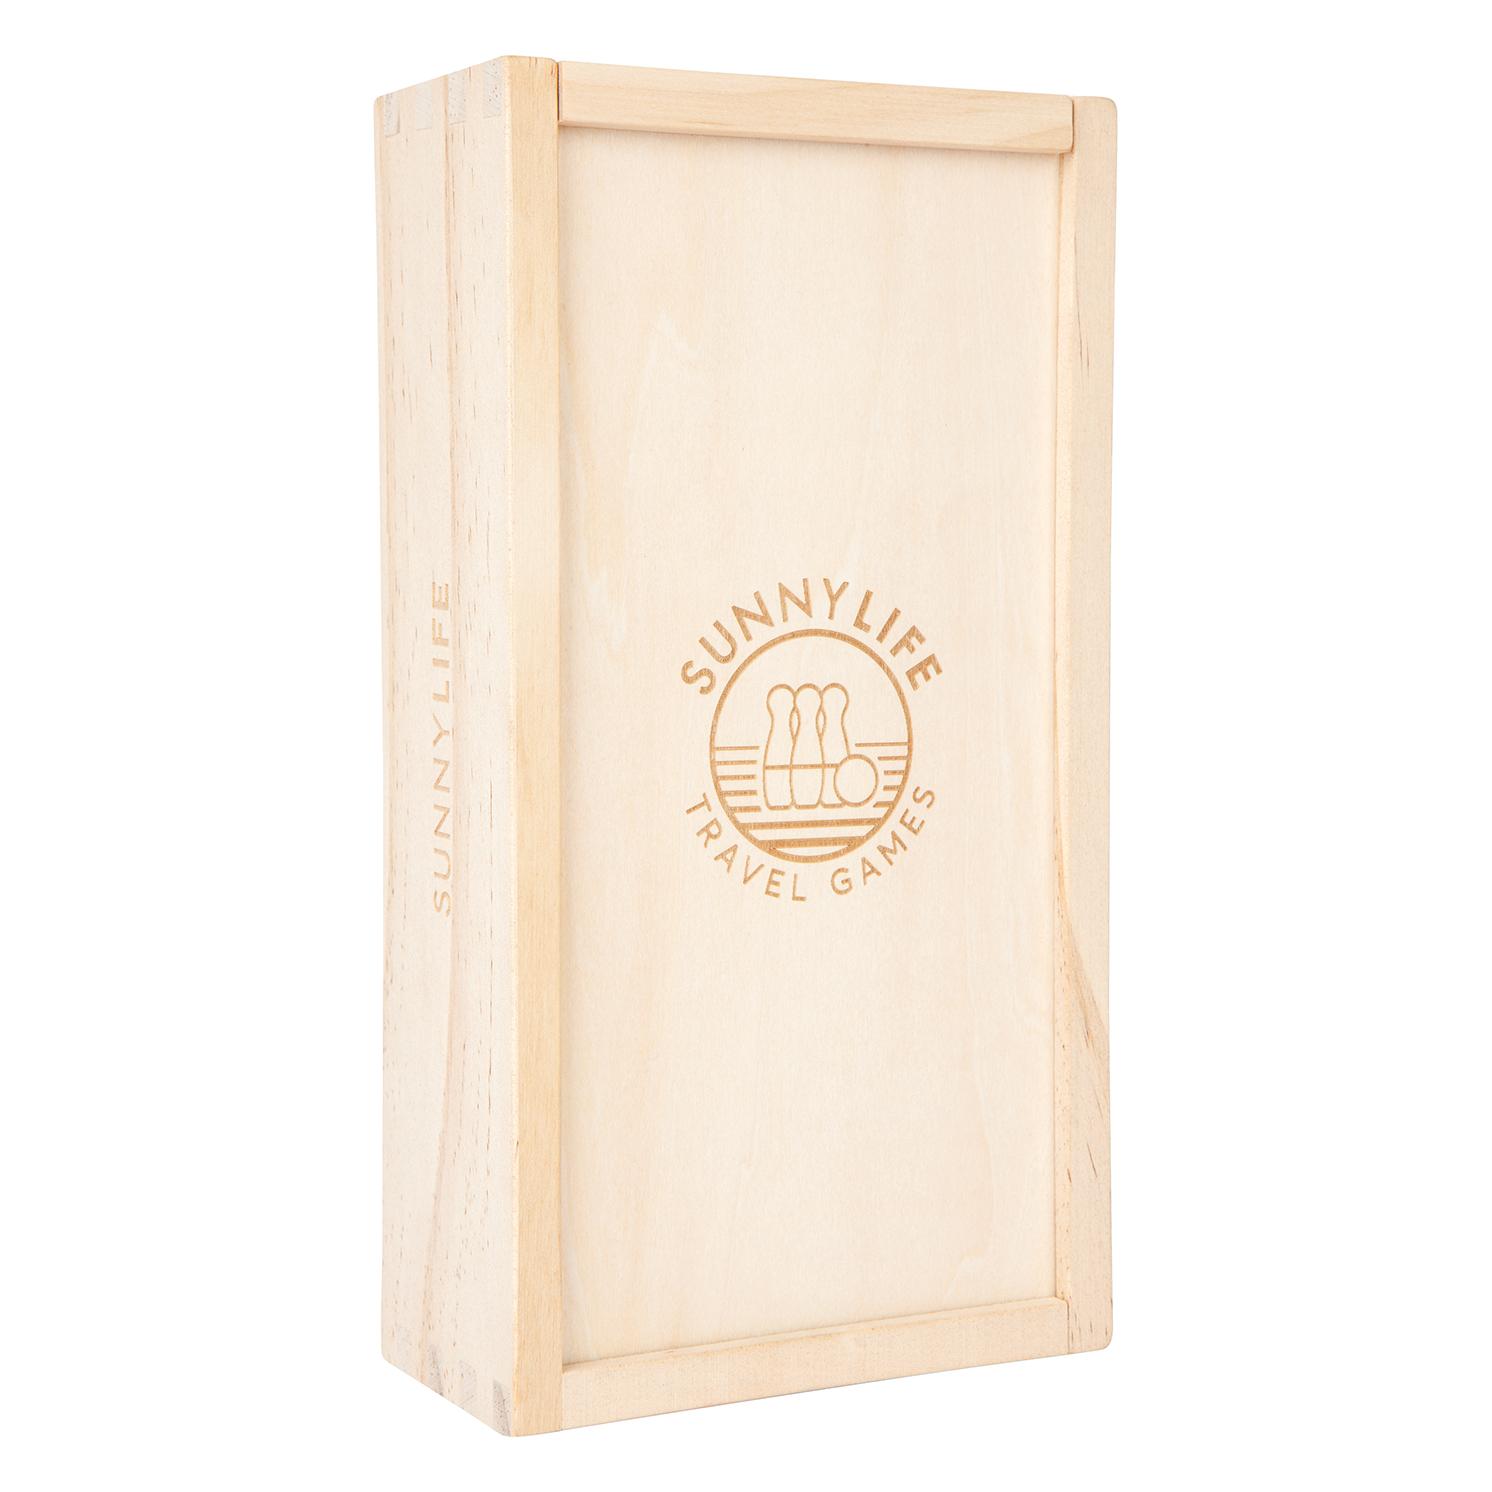 Sunnylife – Mailbu Travel Skittles in Wooden Case